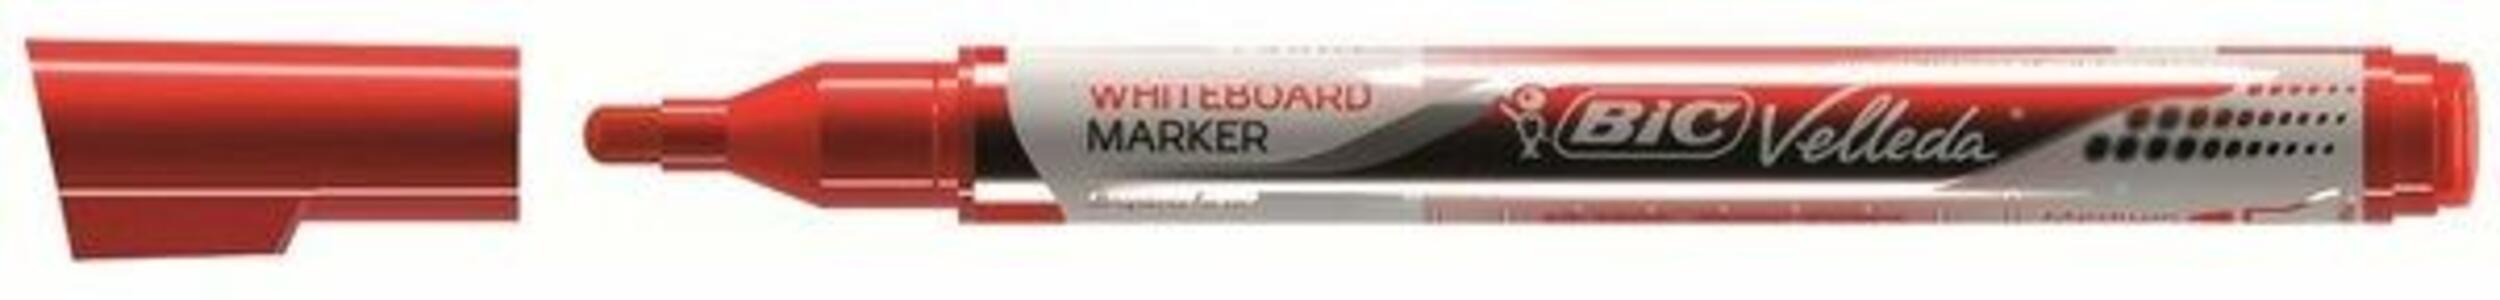 Marcatore Bic Velleda liquido pocket rosso punta 4,2 mm